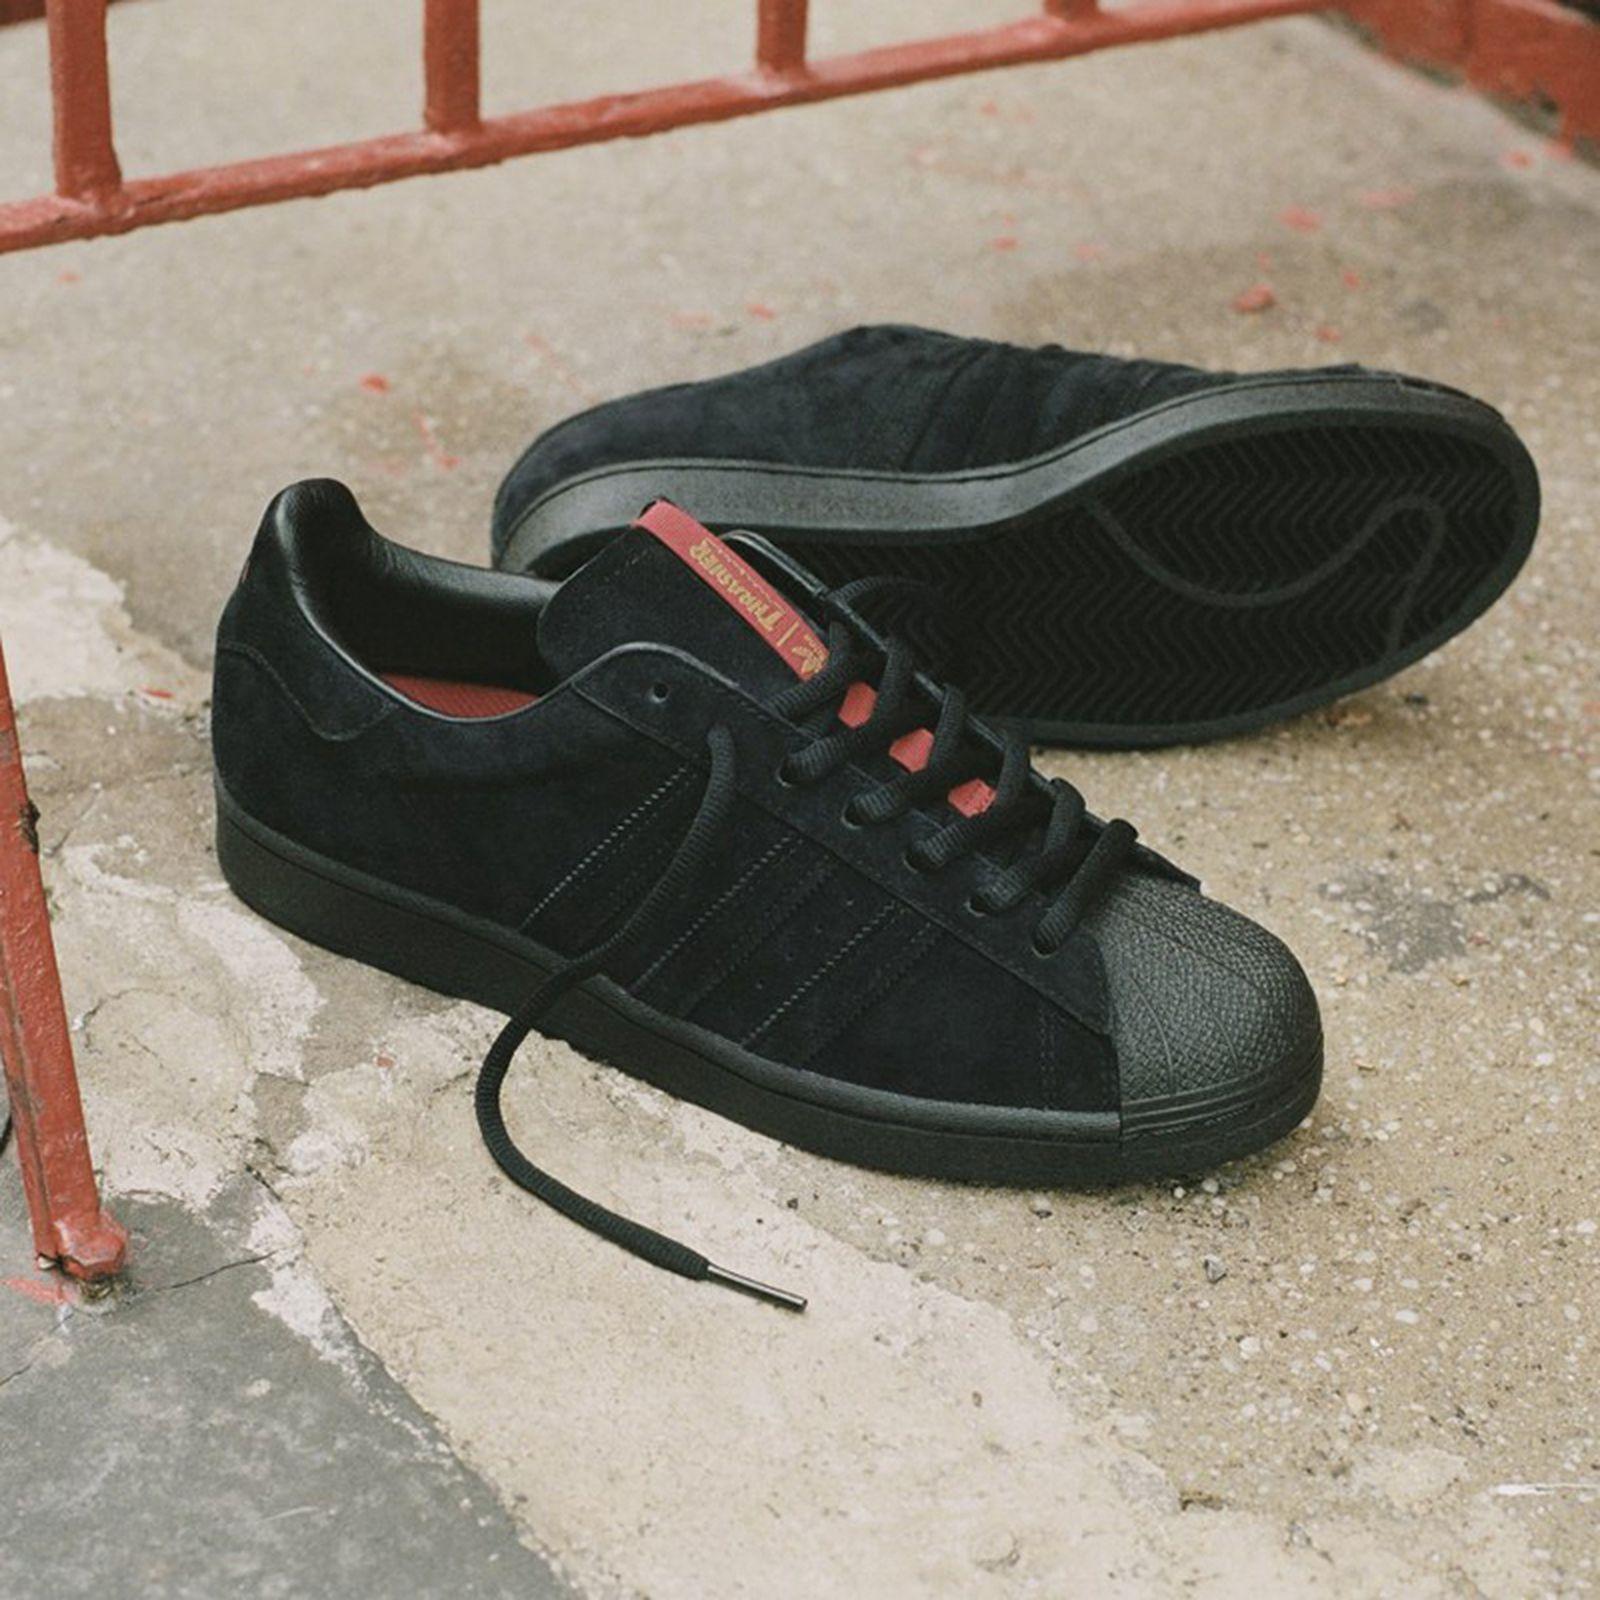 thrasher-adidas-superstar-adv-tyshawn-jones-release-date-price-01